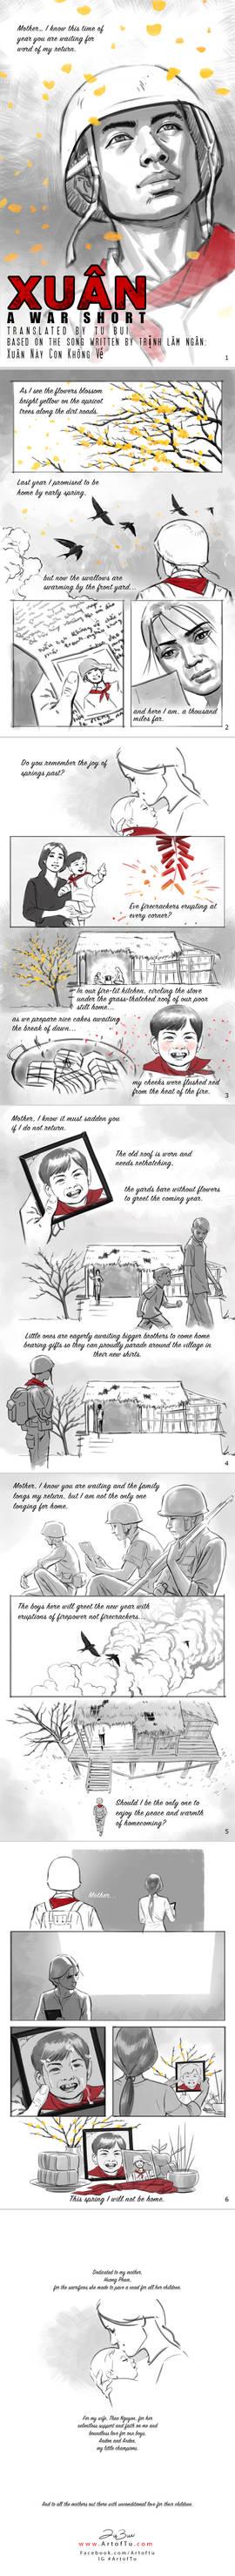 Xuan Short War Comic